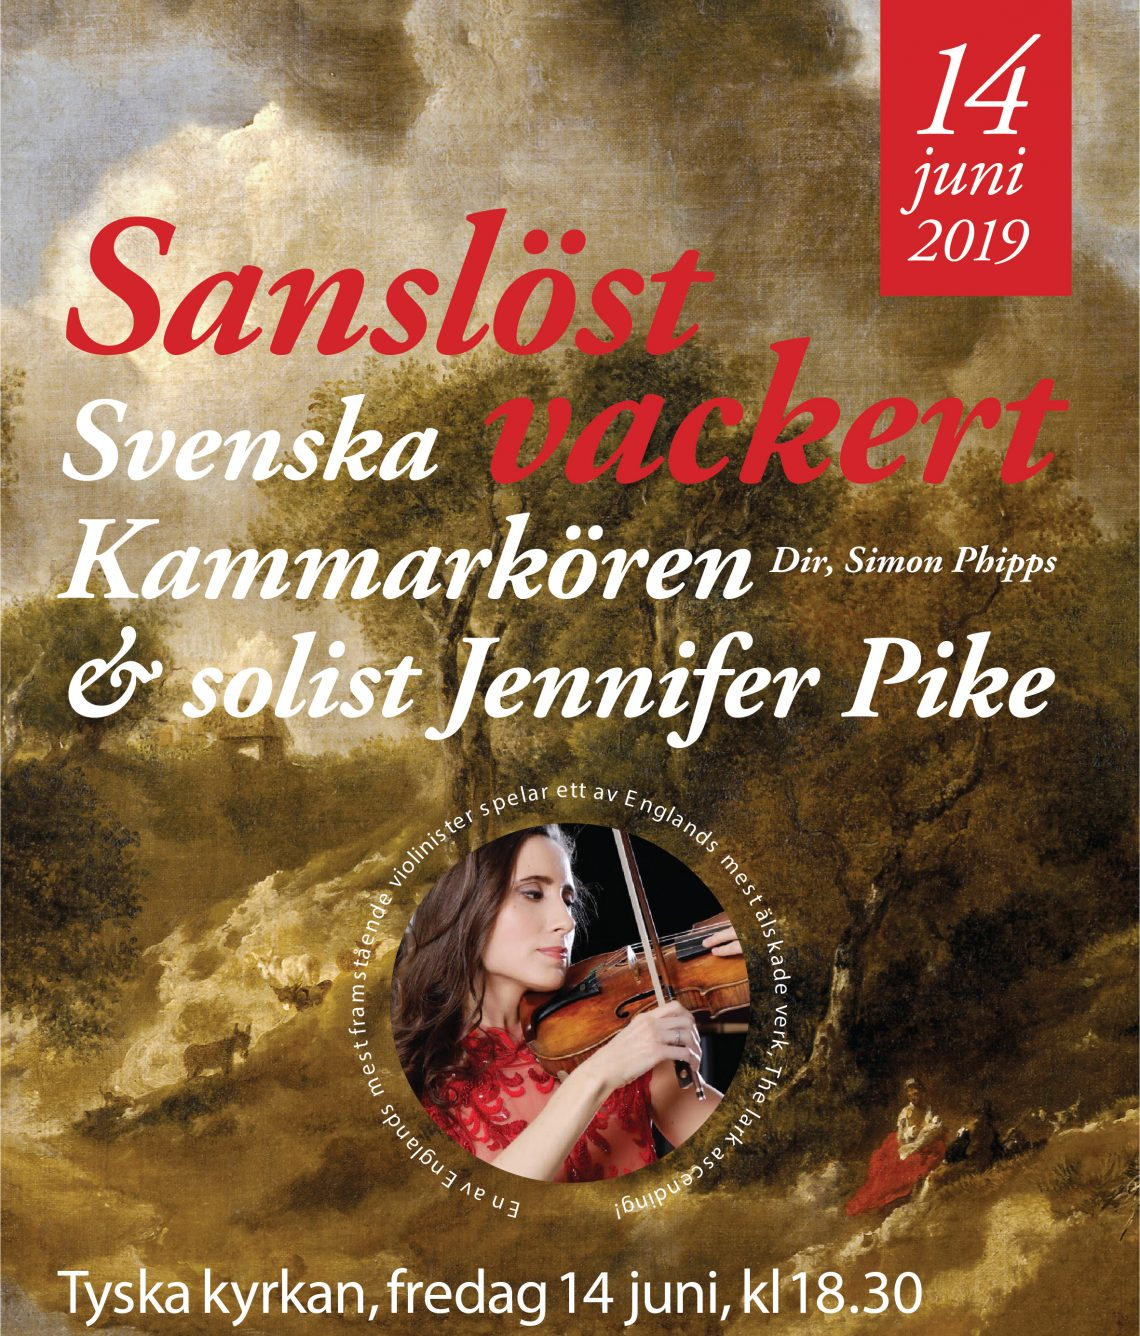 Konsertaffisch med Jennifer Pike